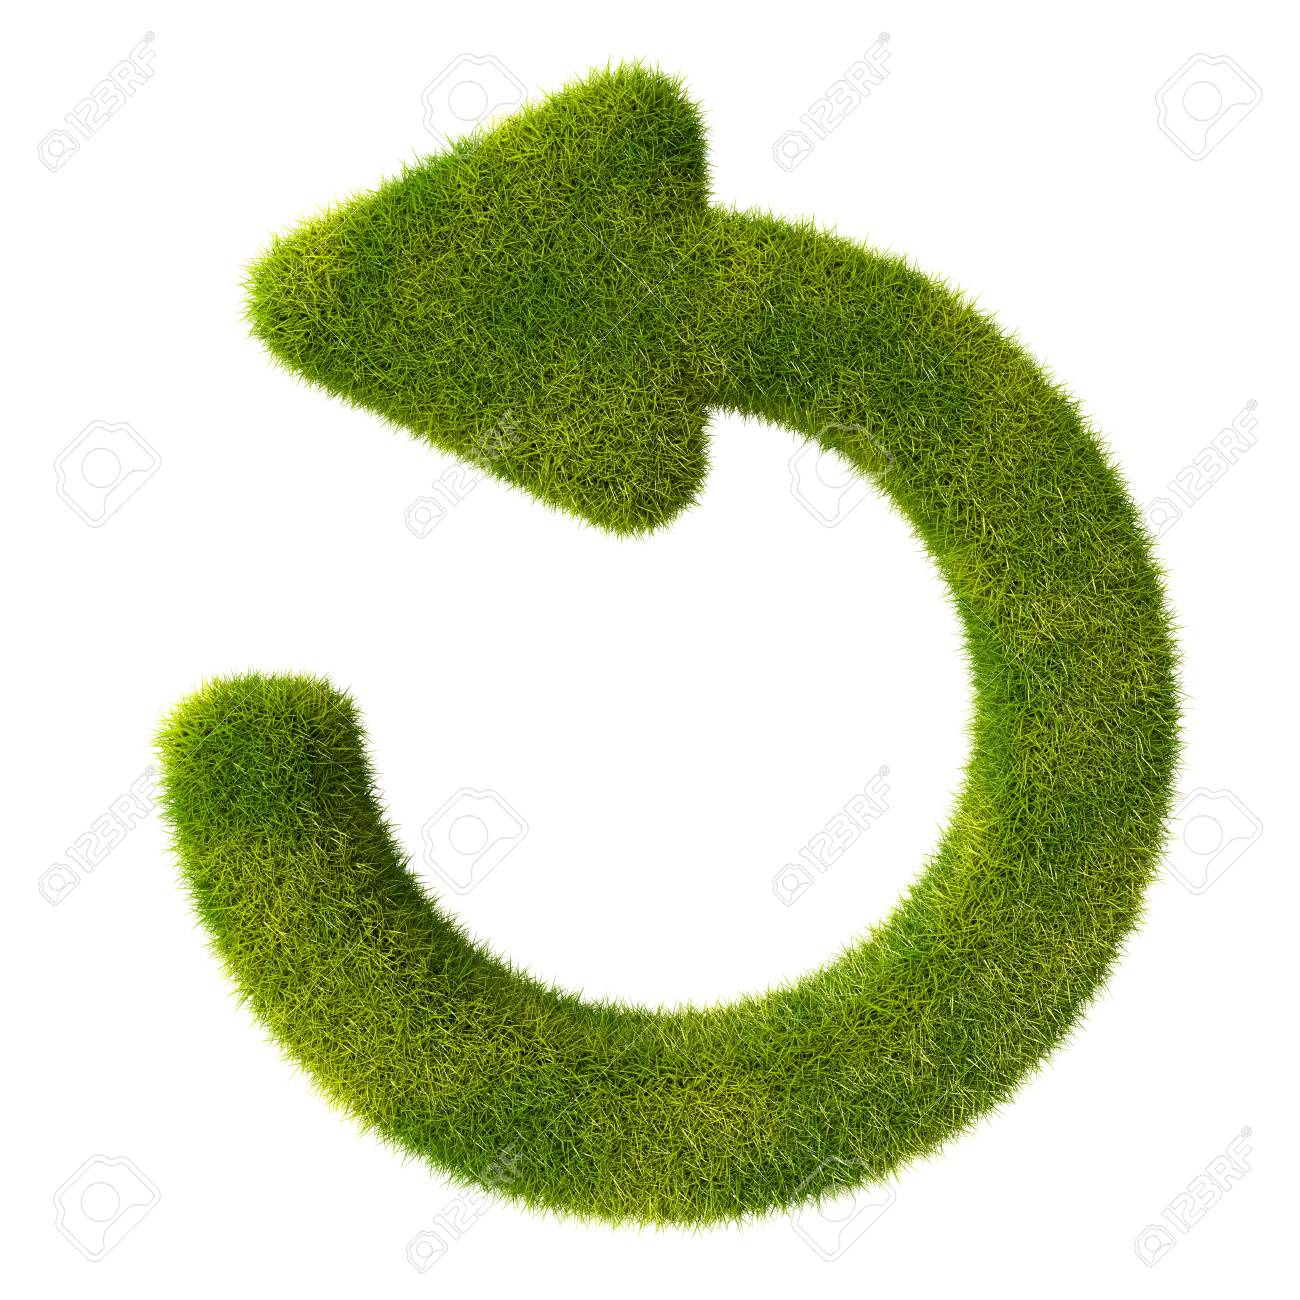 Refresh grass icon Stock Photo - 19166627